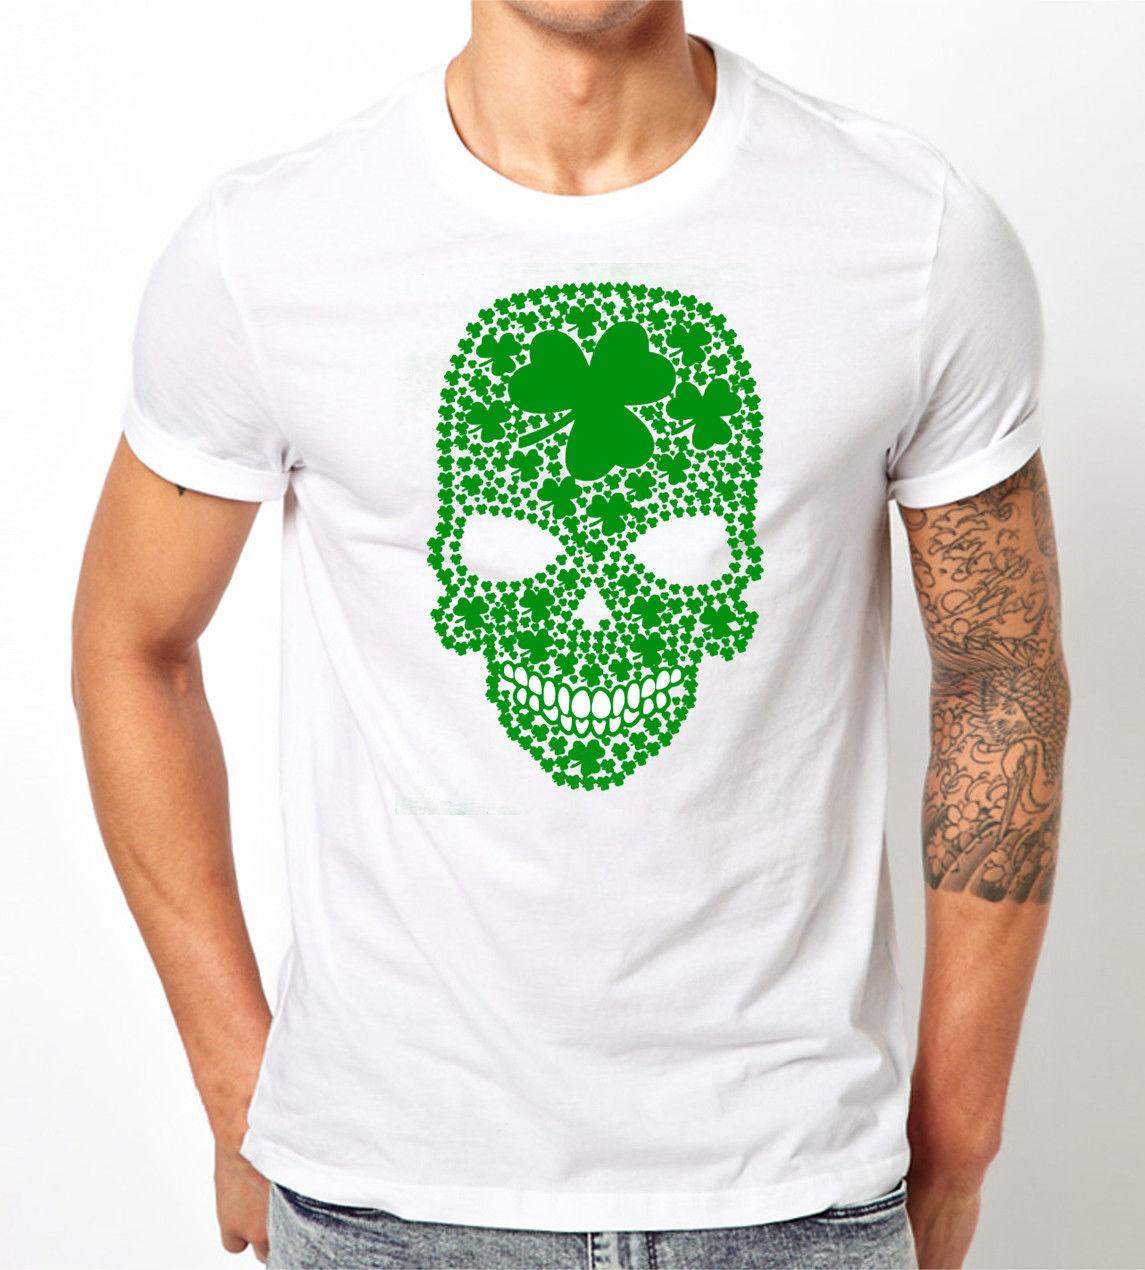 3eed47ce Shamrock Skull Unisex t-shirt. Funny st Patrick's day shirt parade Irish  green Cotton Men T Shirts Classical Top Tee Basic Models